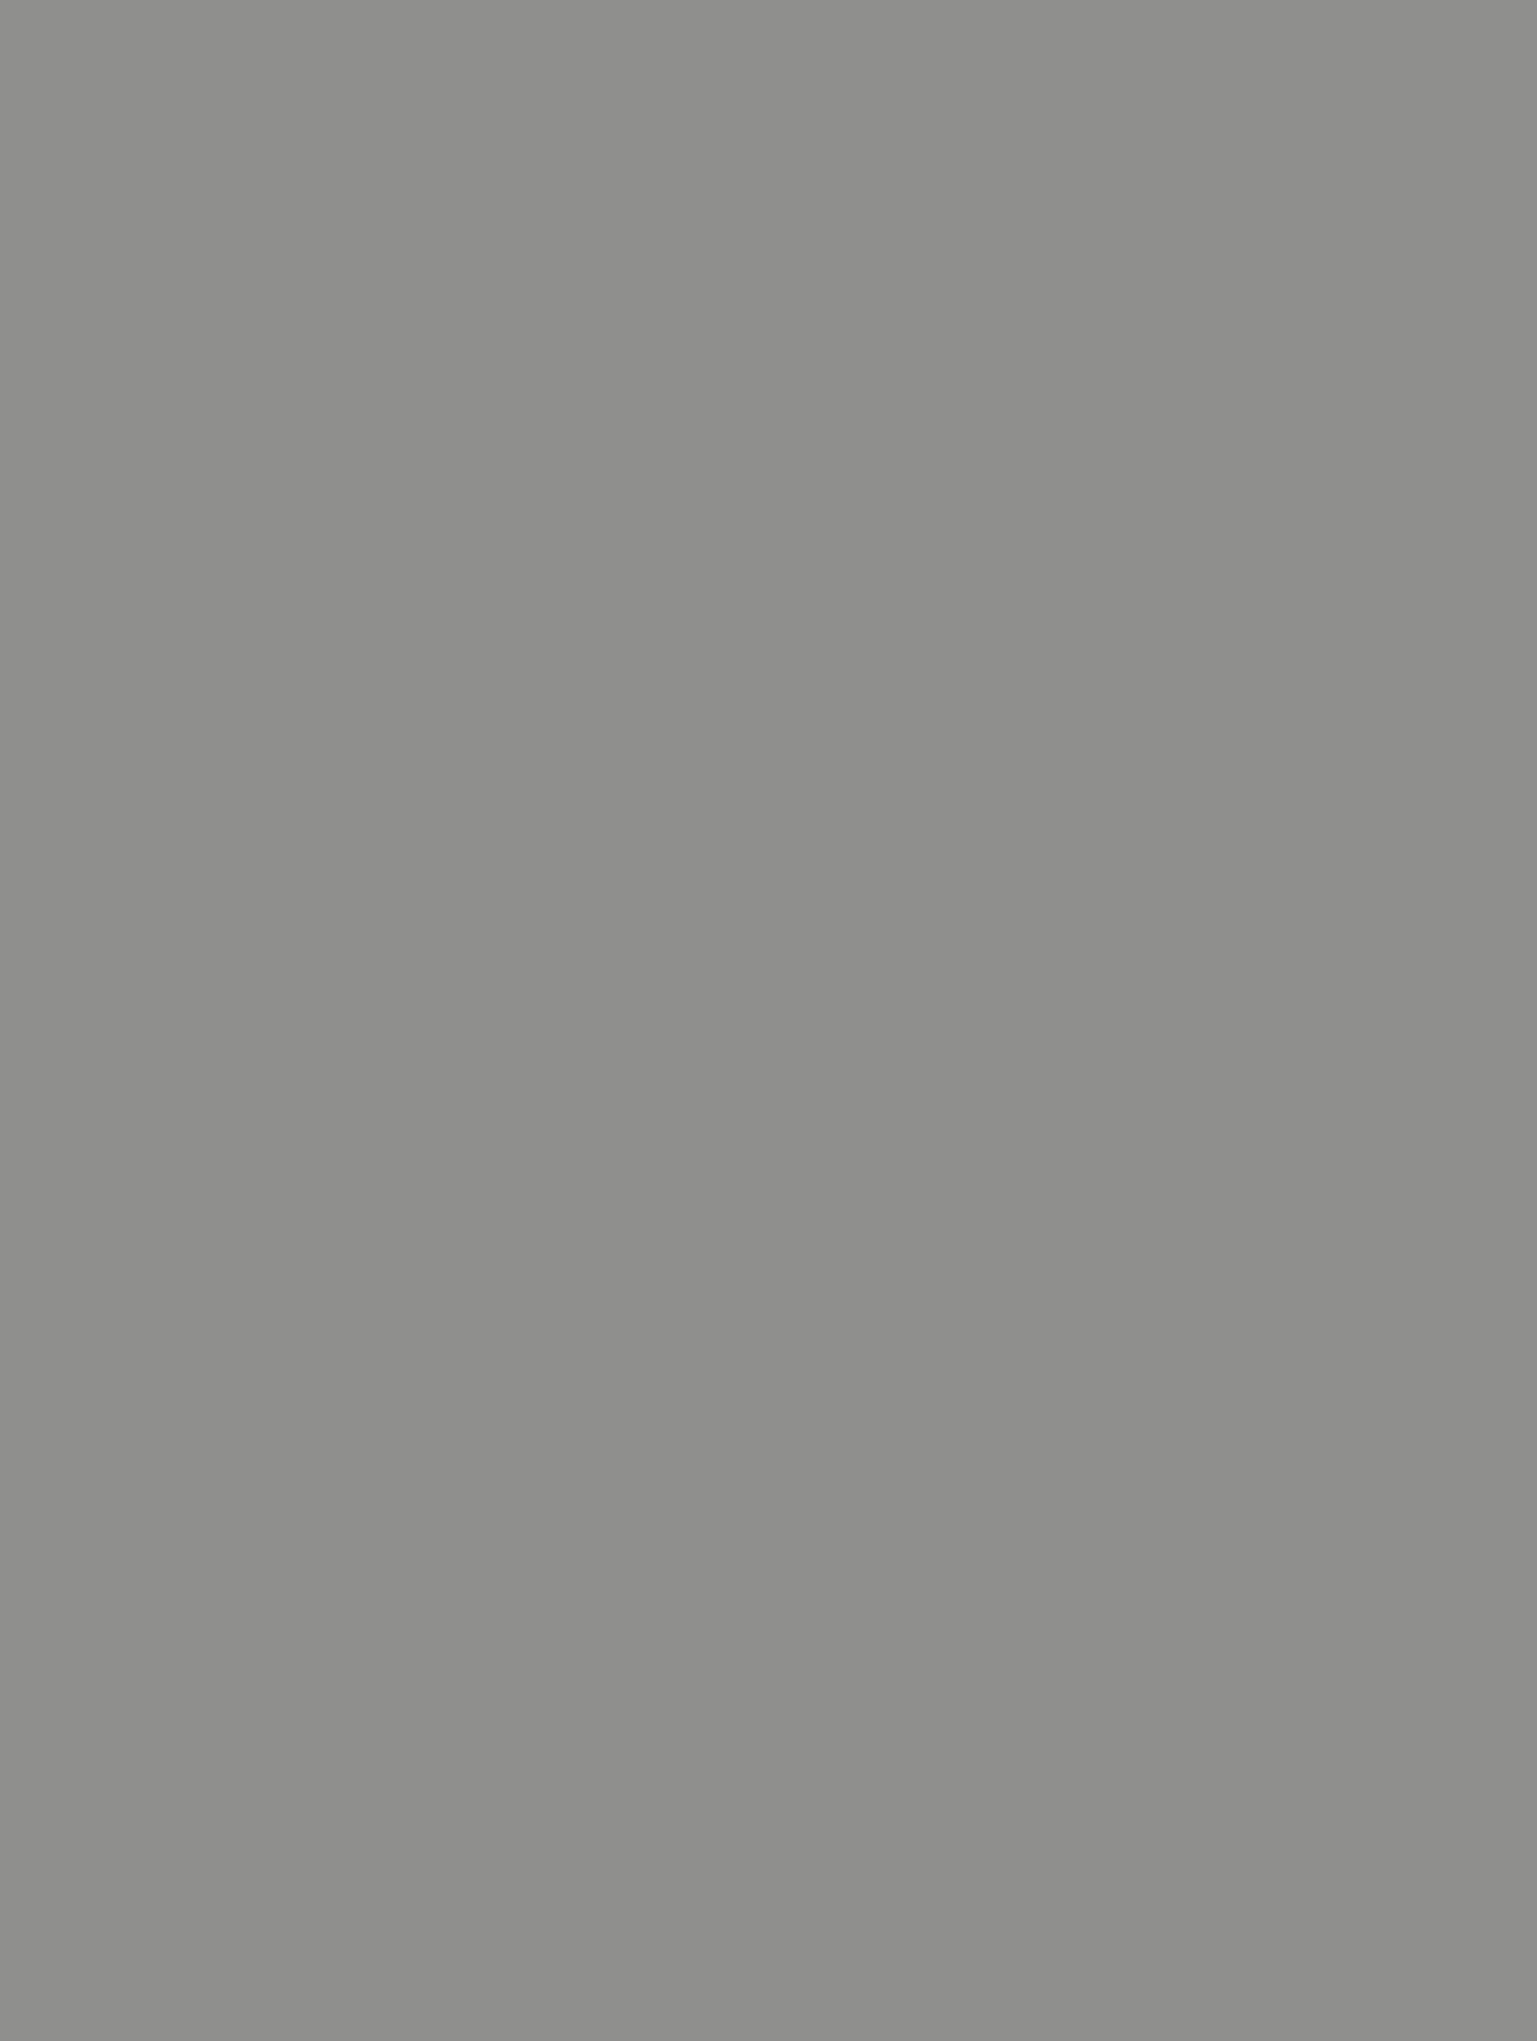 KGK Group